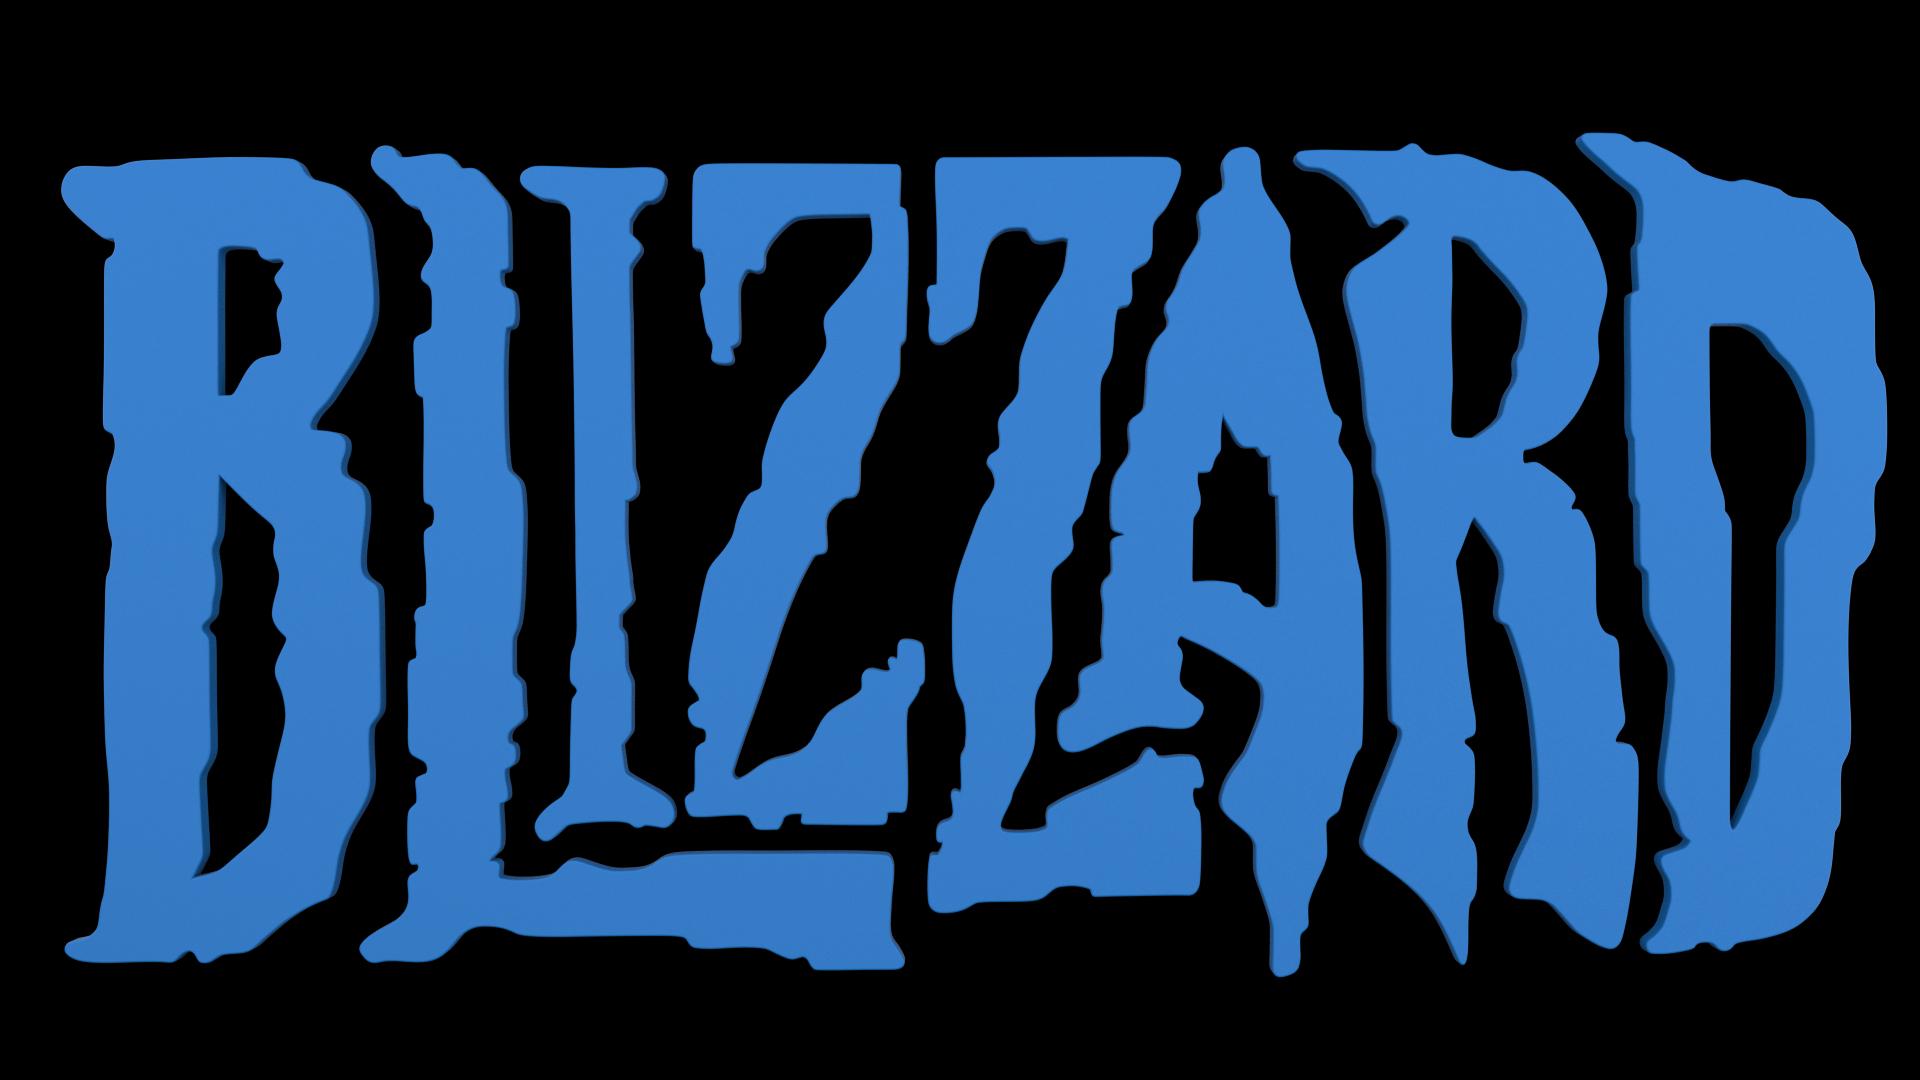 Świąteczne promocje, m.in.: Diablo 3, Rise of the Necromancer, Reaper of Souls, World of Warcraft @Blizzard